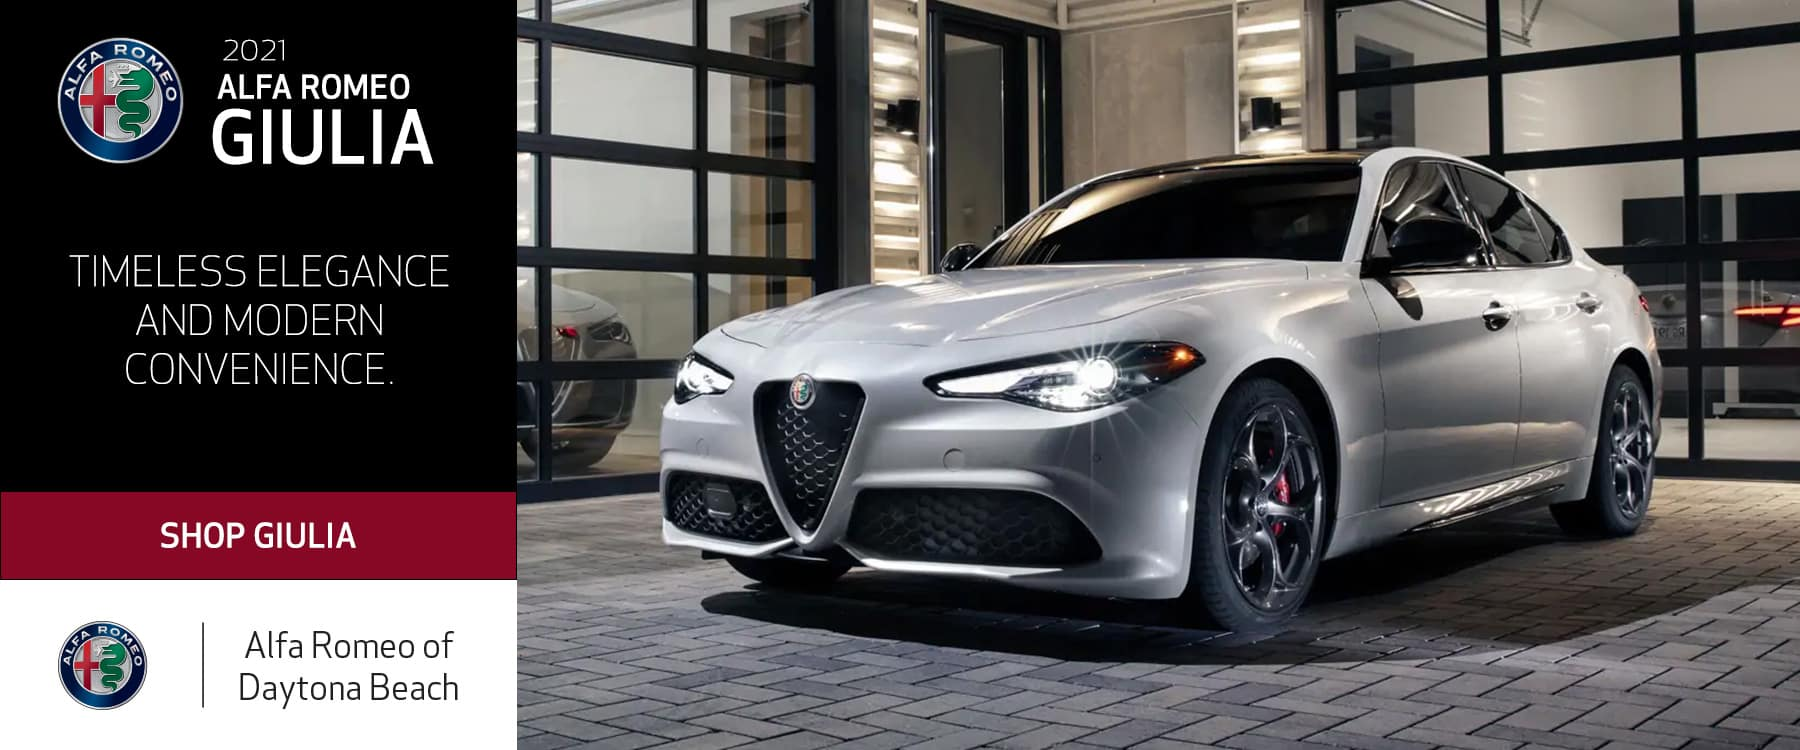 DMAR-2021-Alfa-Romeo-1800×750-MY21-Giulia-Evergreen